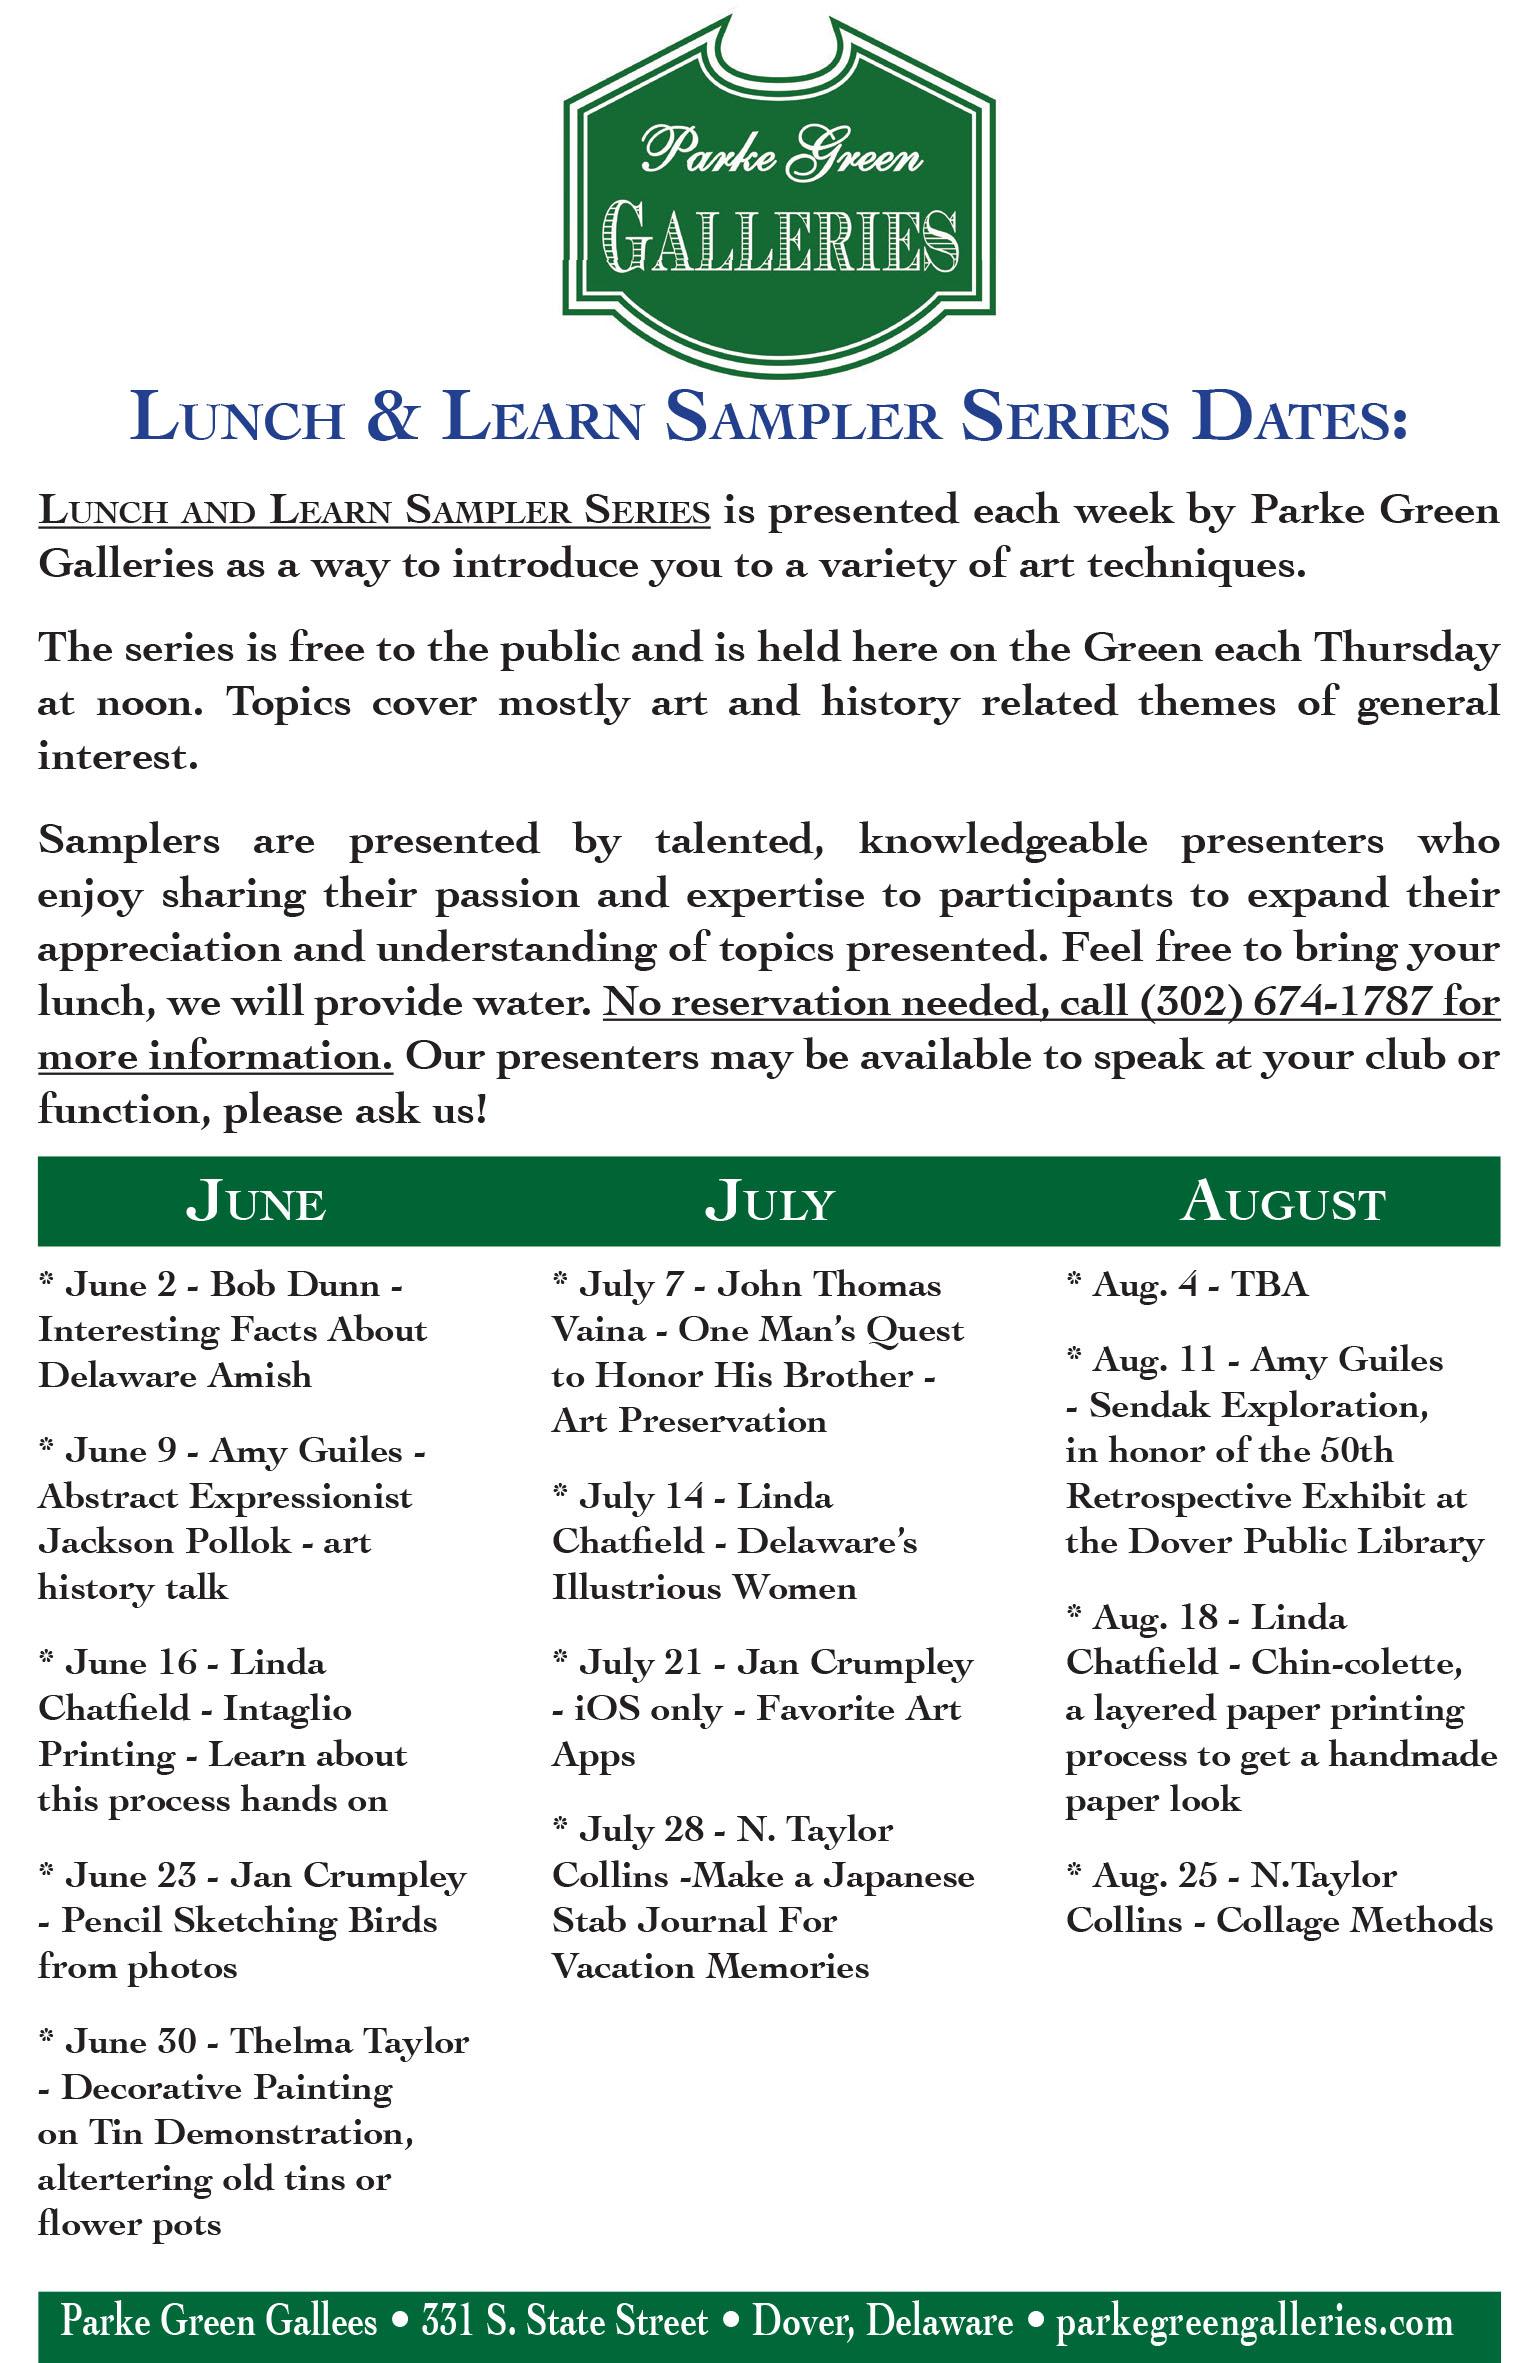 Lunch & Learn flyer 2 up june-aug2016.jpg